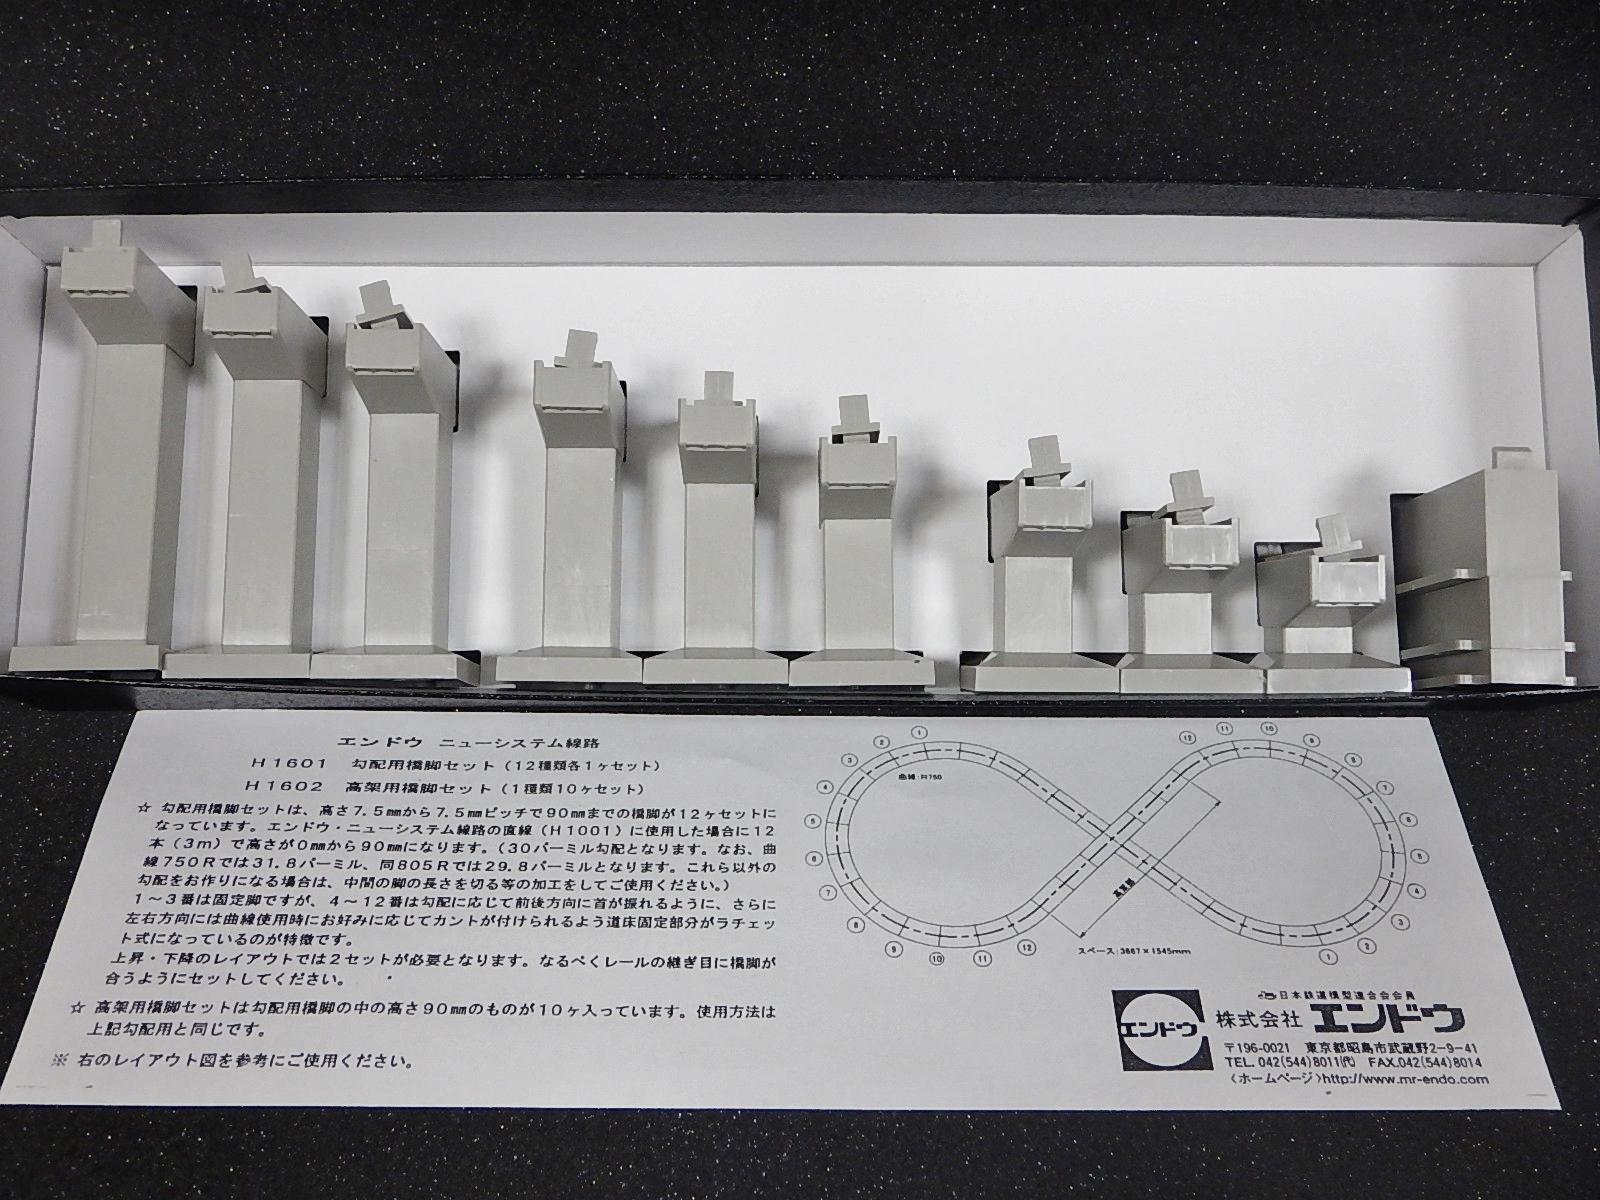 勾配橋脚12脚セット(3%勾配用)